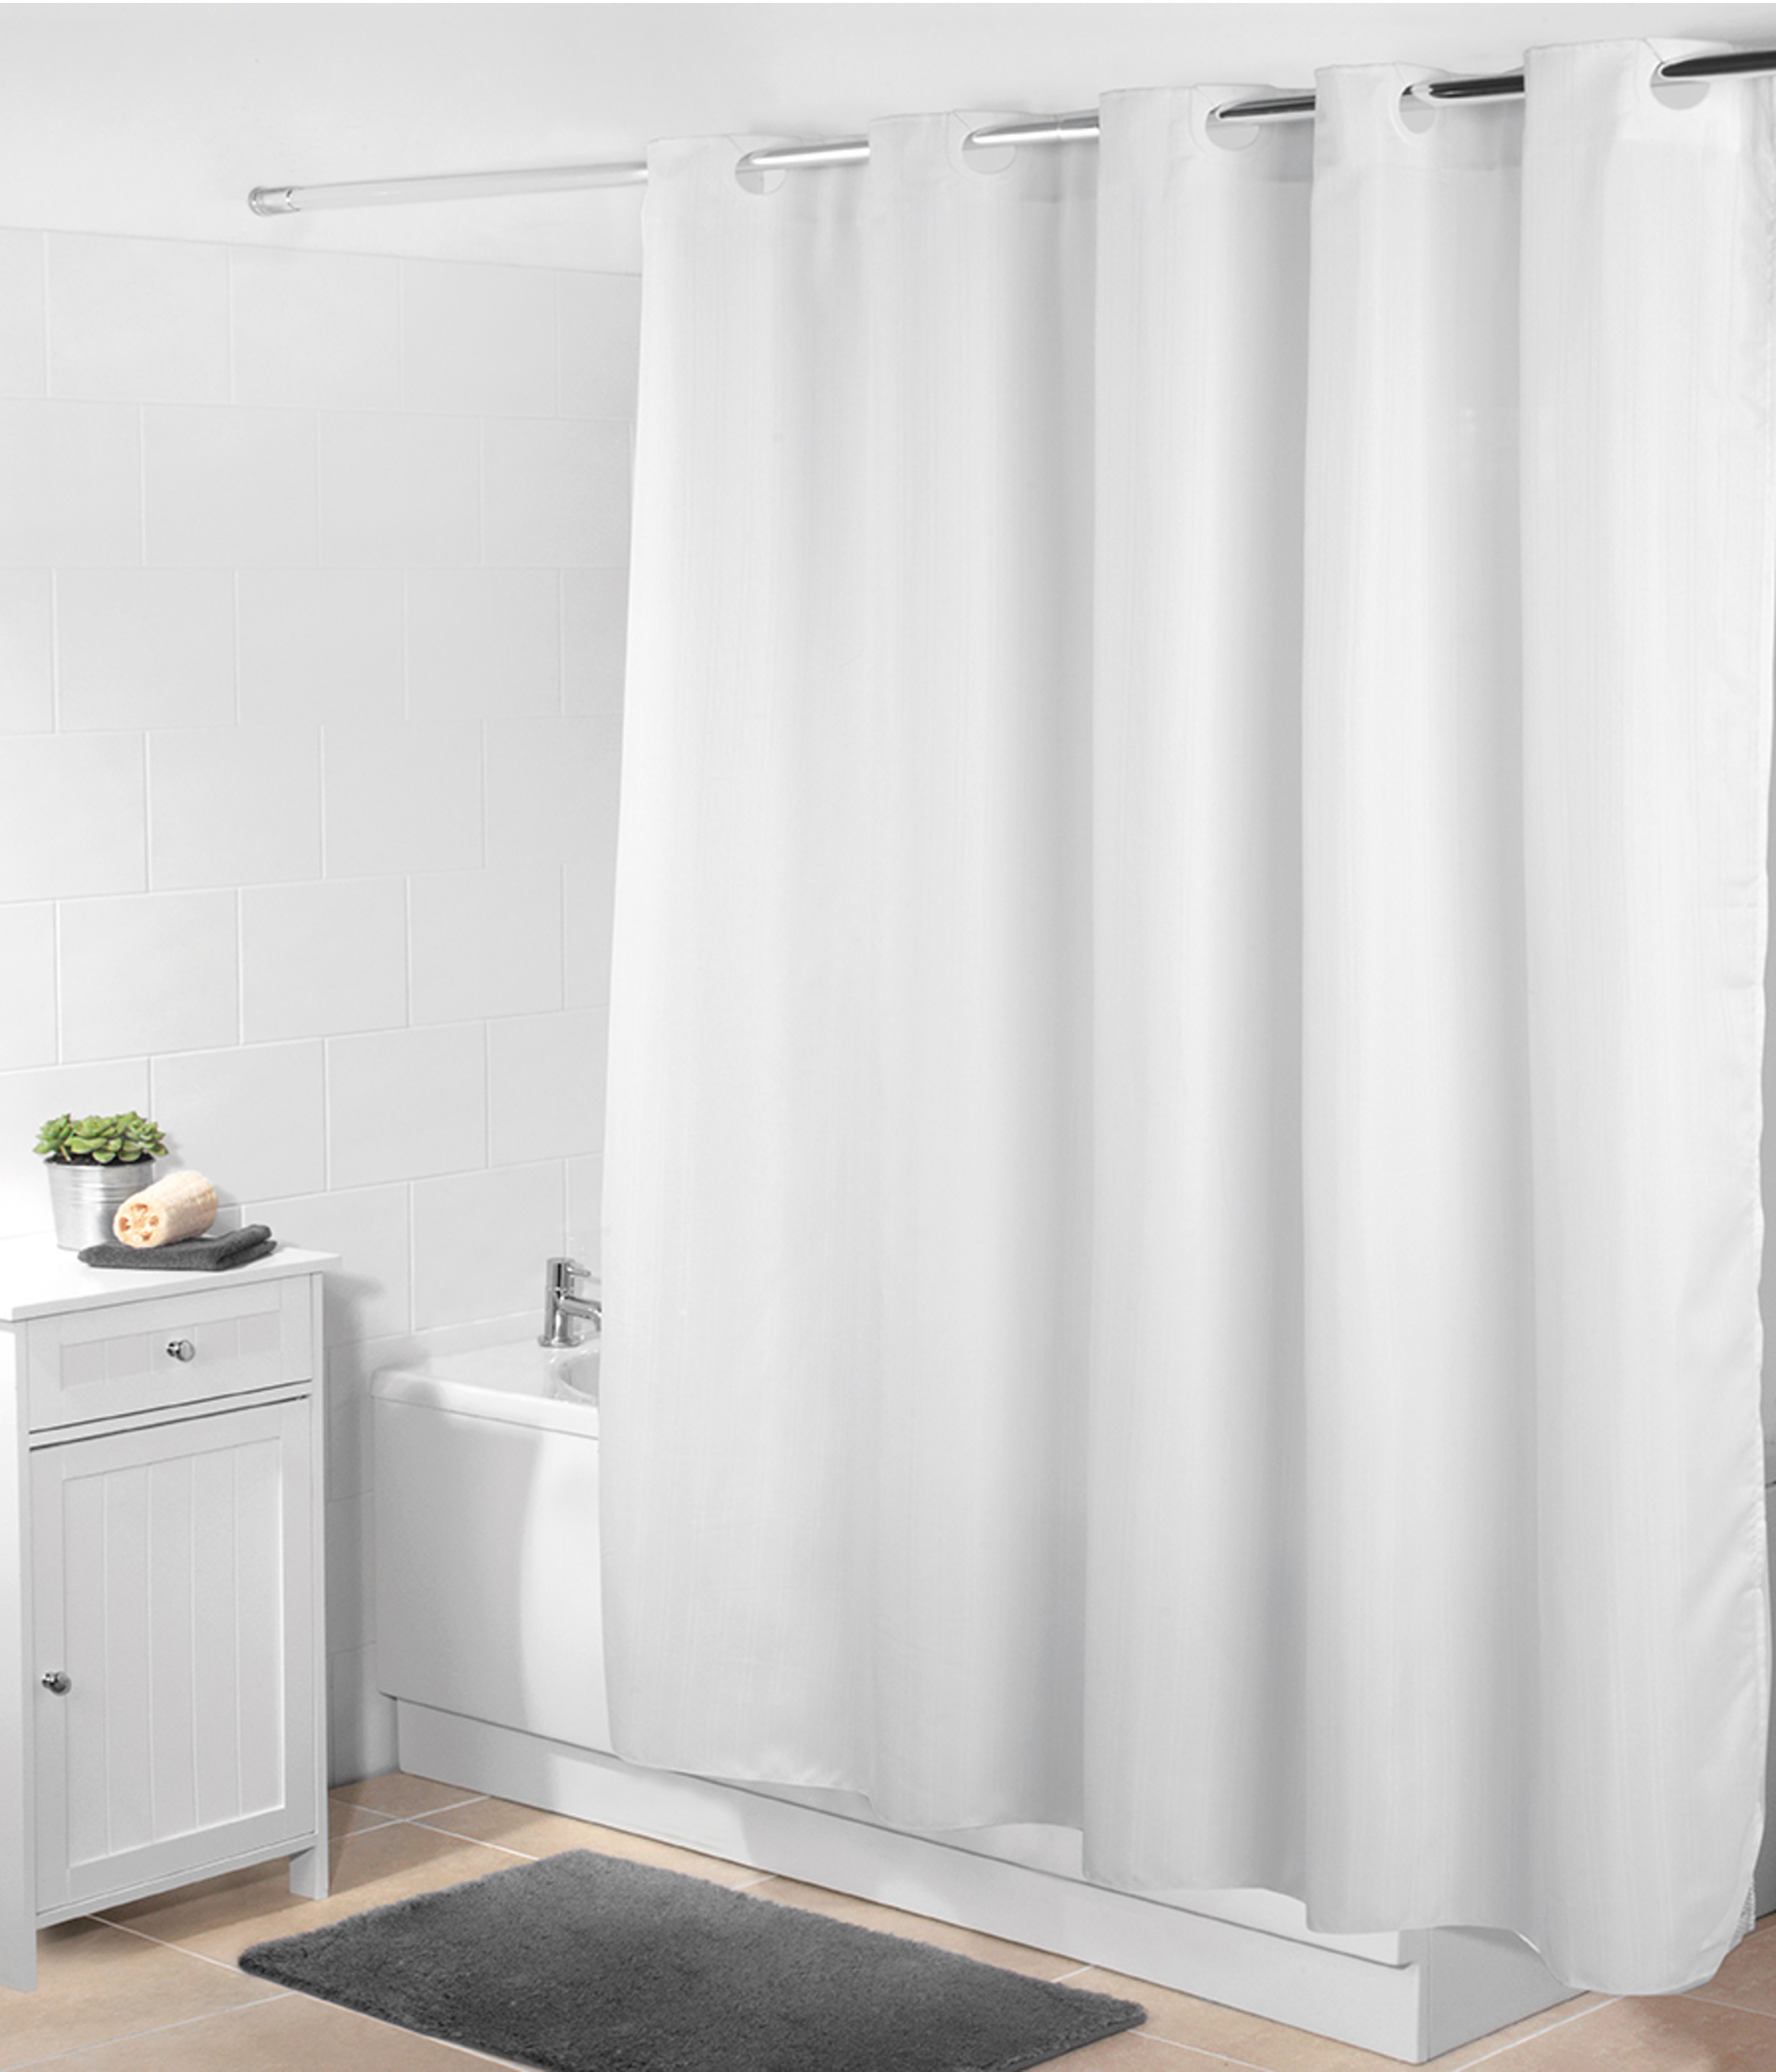 Beldray Jacquard Striped Hookless Shower Curtain, 180 x 185 cm ...